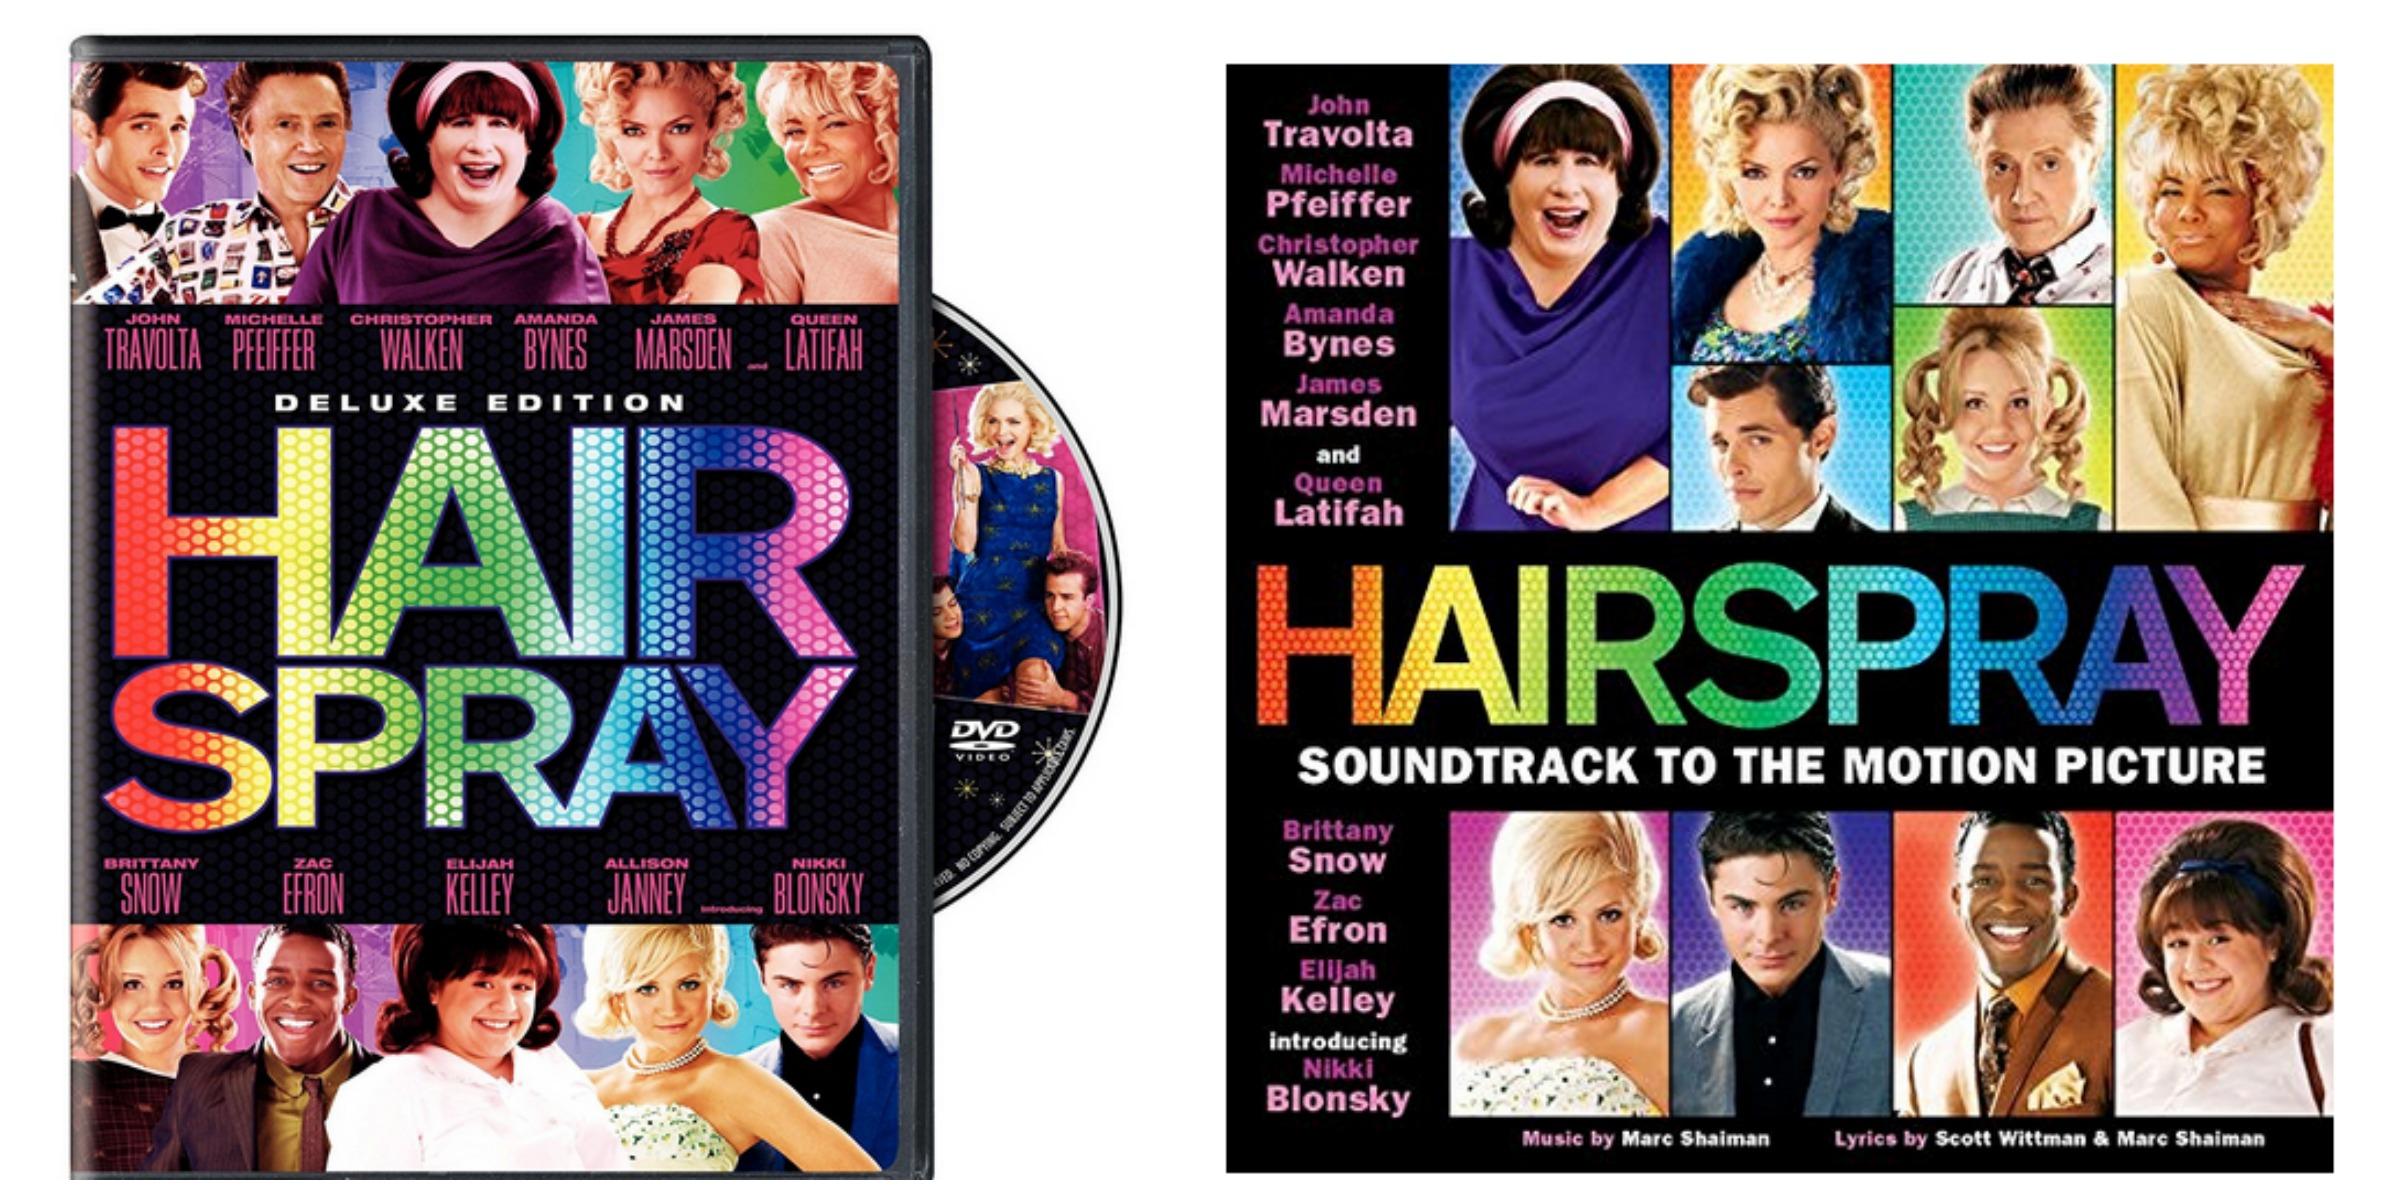 Hair movie soundtrack